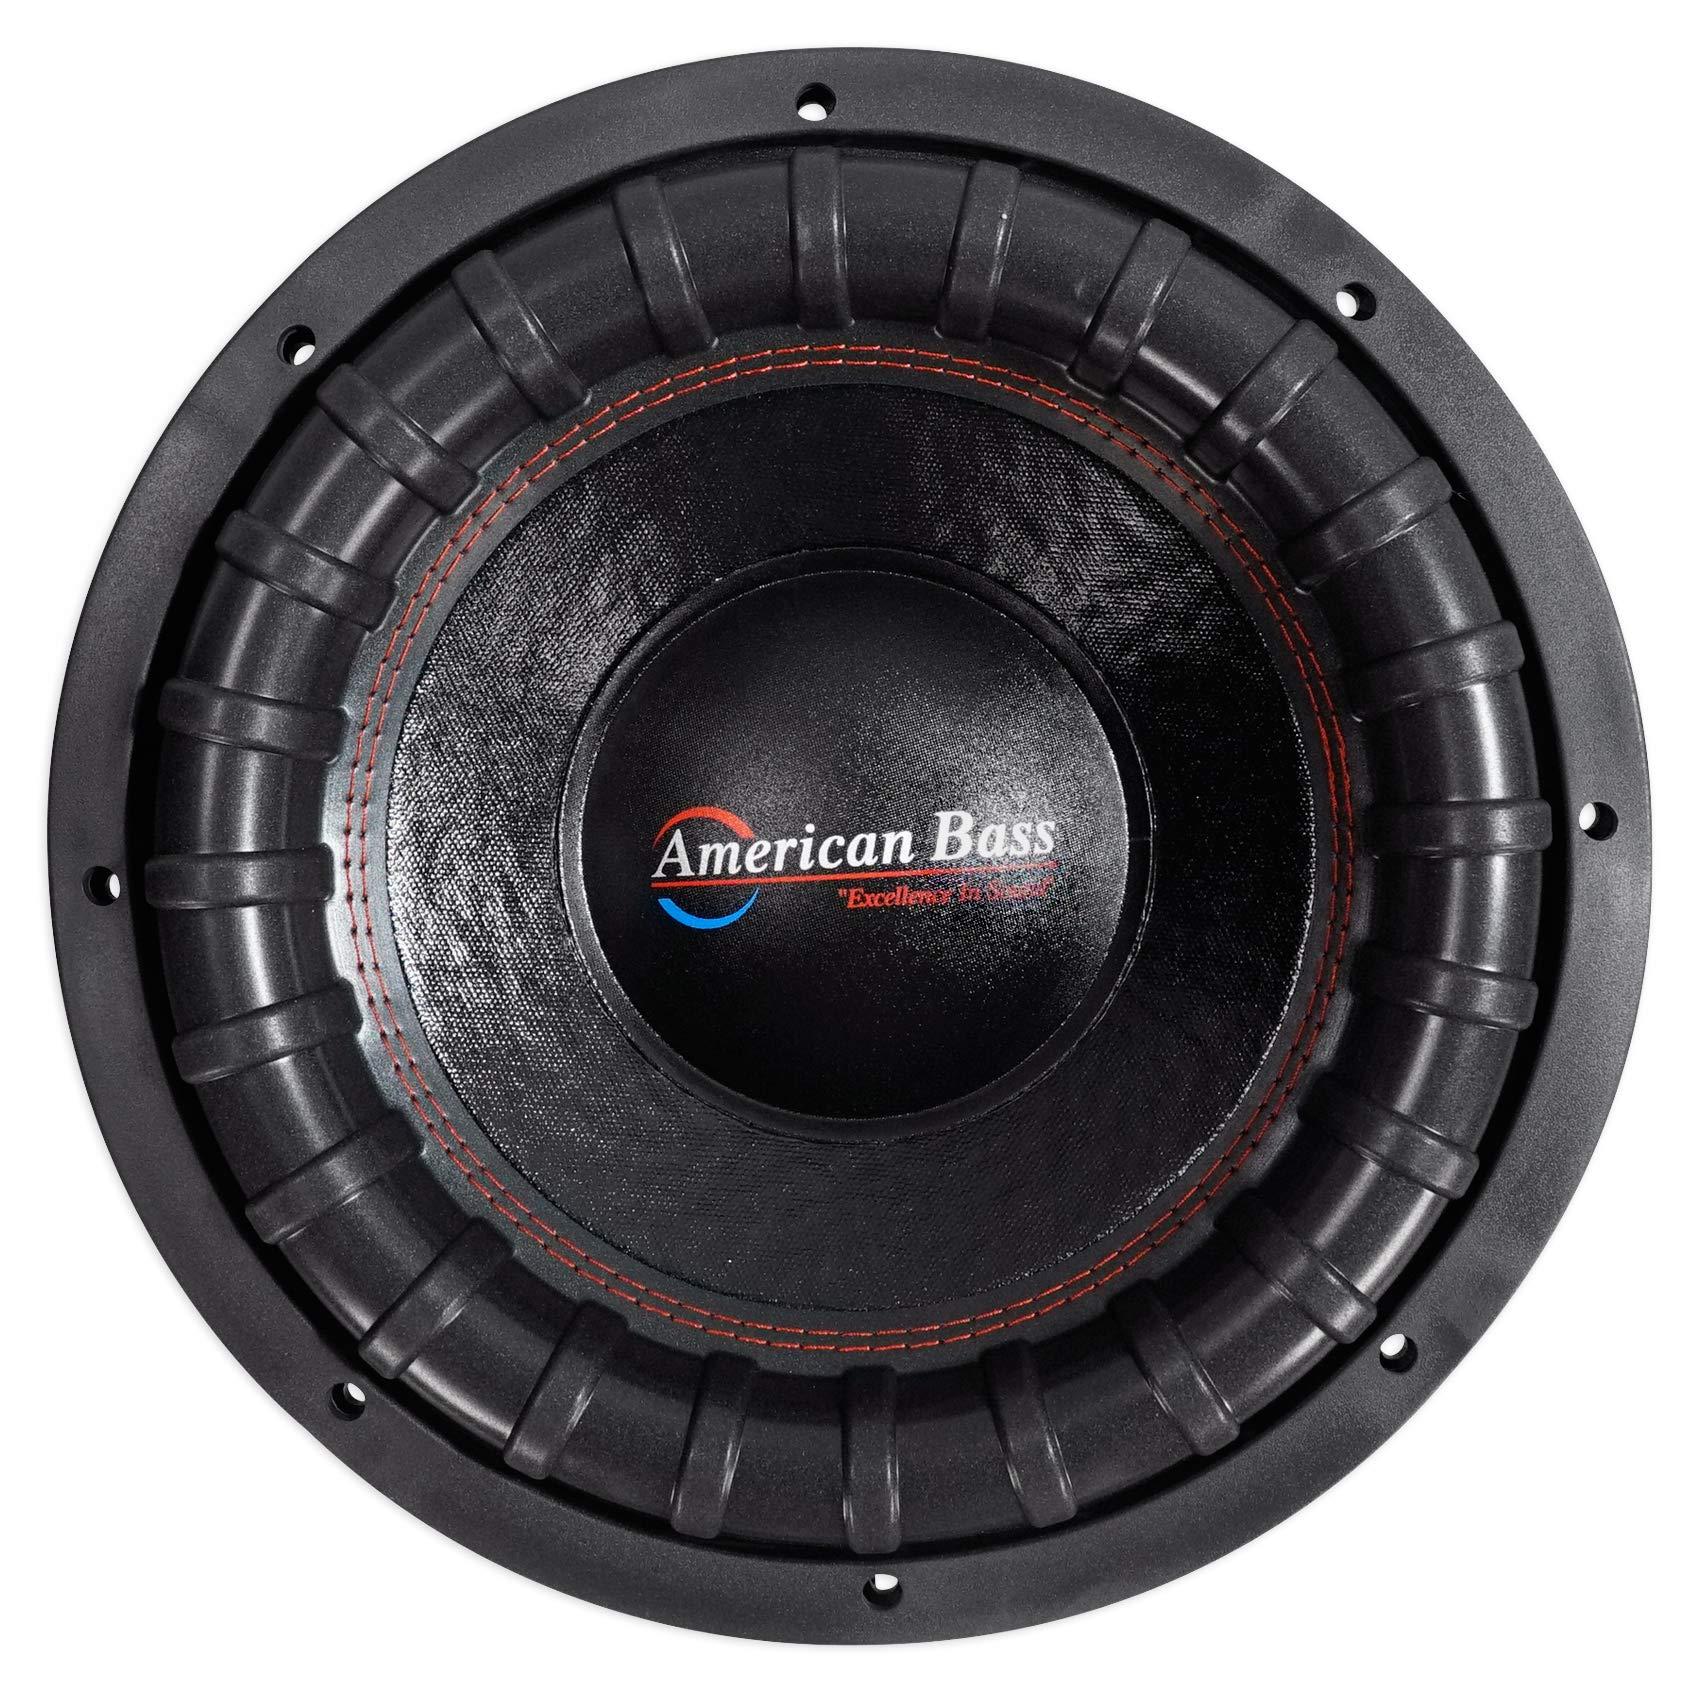 "American Bass USA XFL 1244 2000W Max Dual 4Ω 12"" Subwoofer"